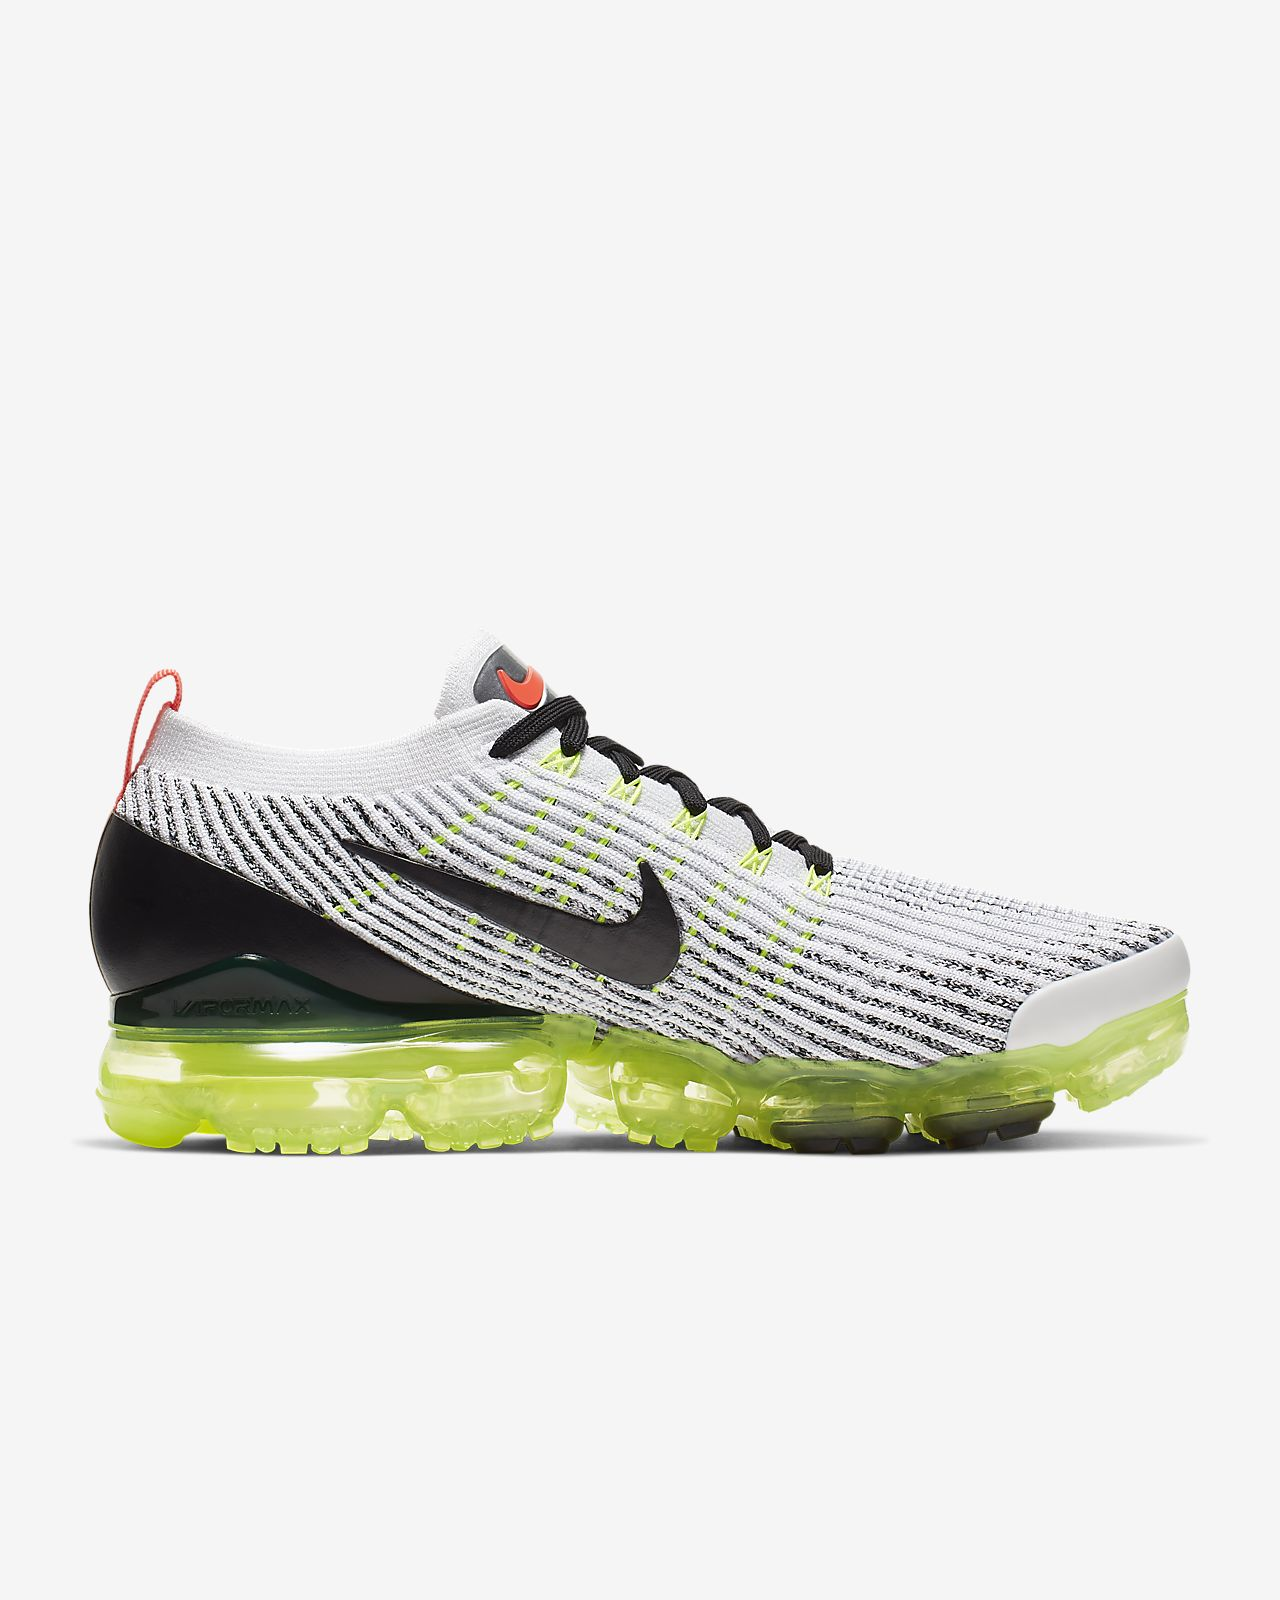 ab04c33b33bc9 Nike Air VaporMax Flyknit 3 Men s Shoe. Nike.com GB